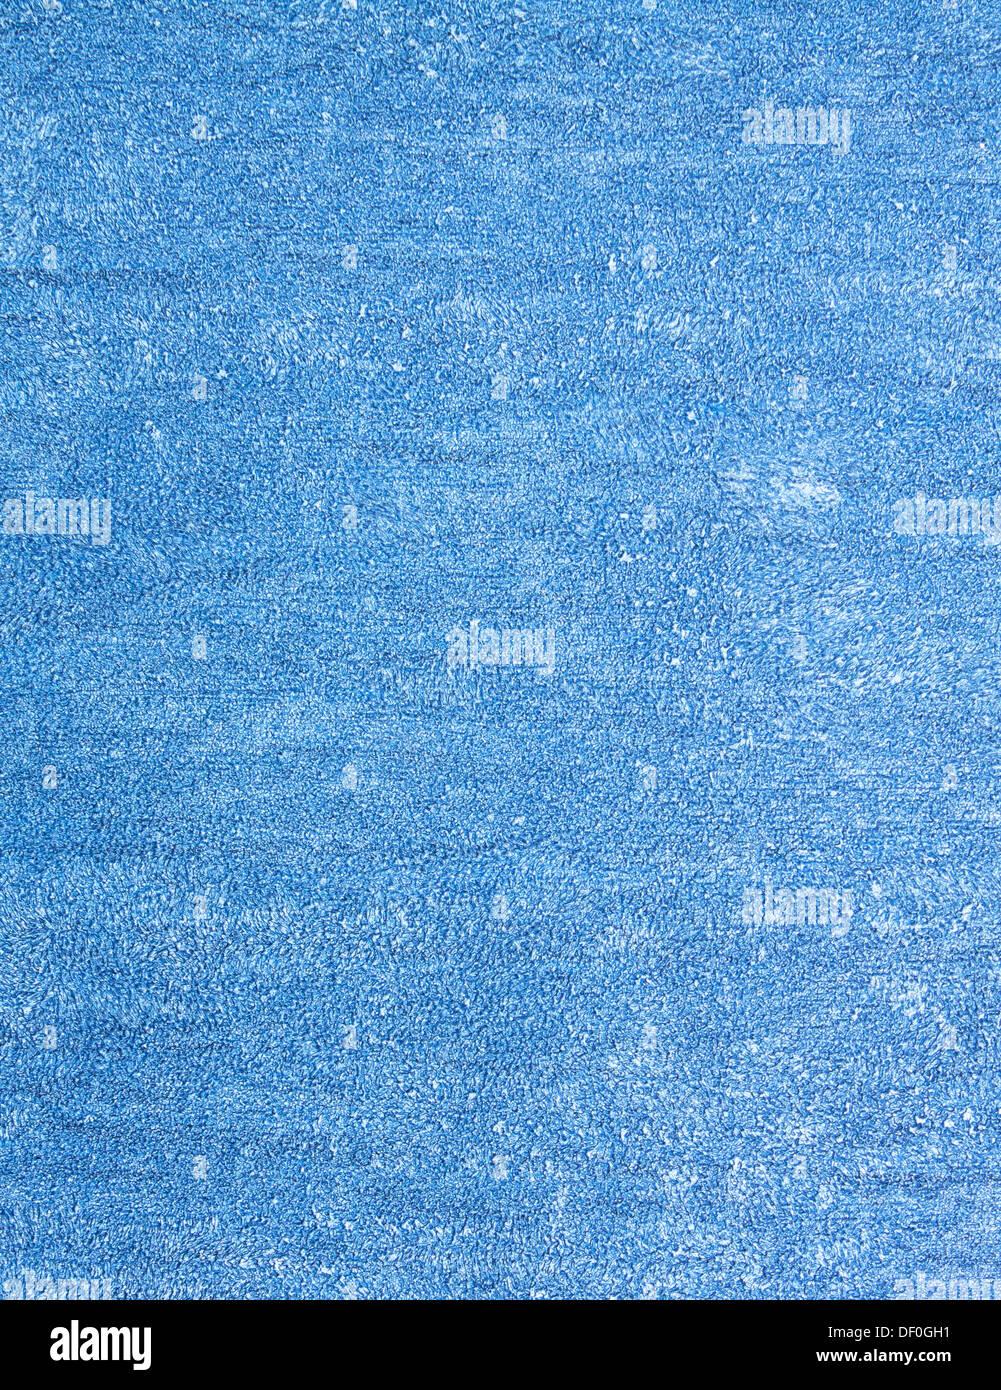 Top Wallpaper High Quality Texture - background-wallpaper-high-resolution-the-interior-walls-DF0GH1  HD_487425.jpg